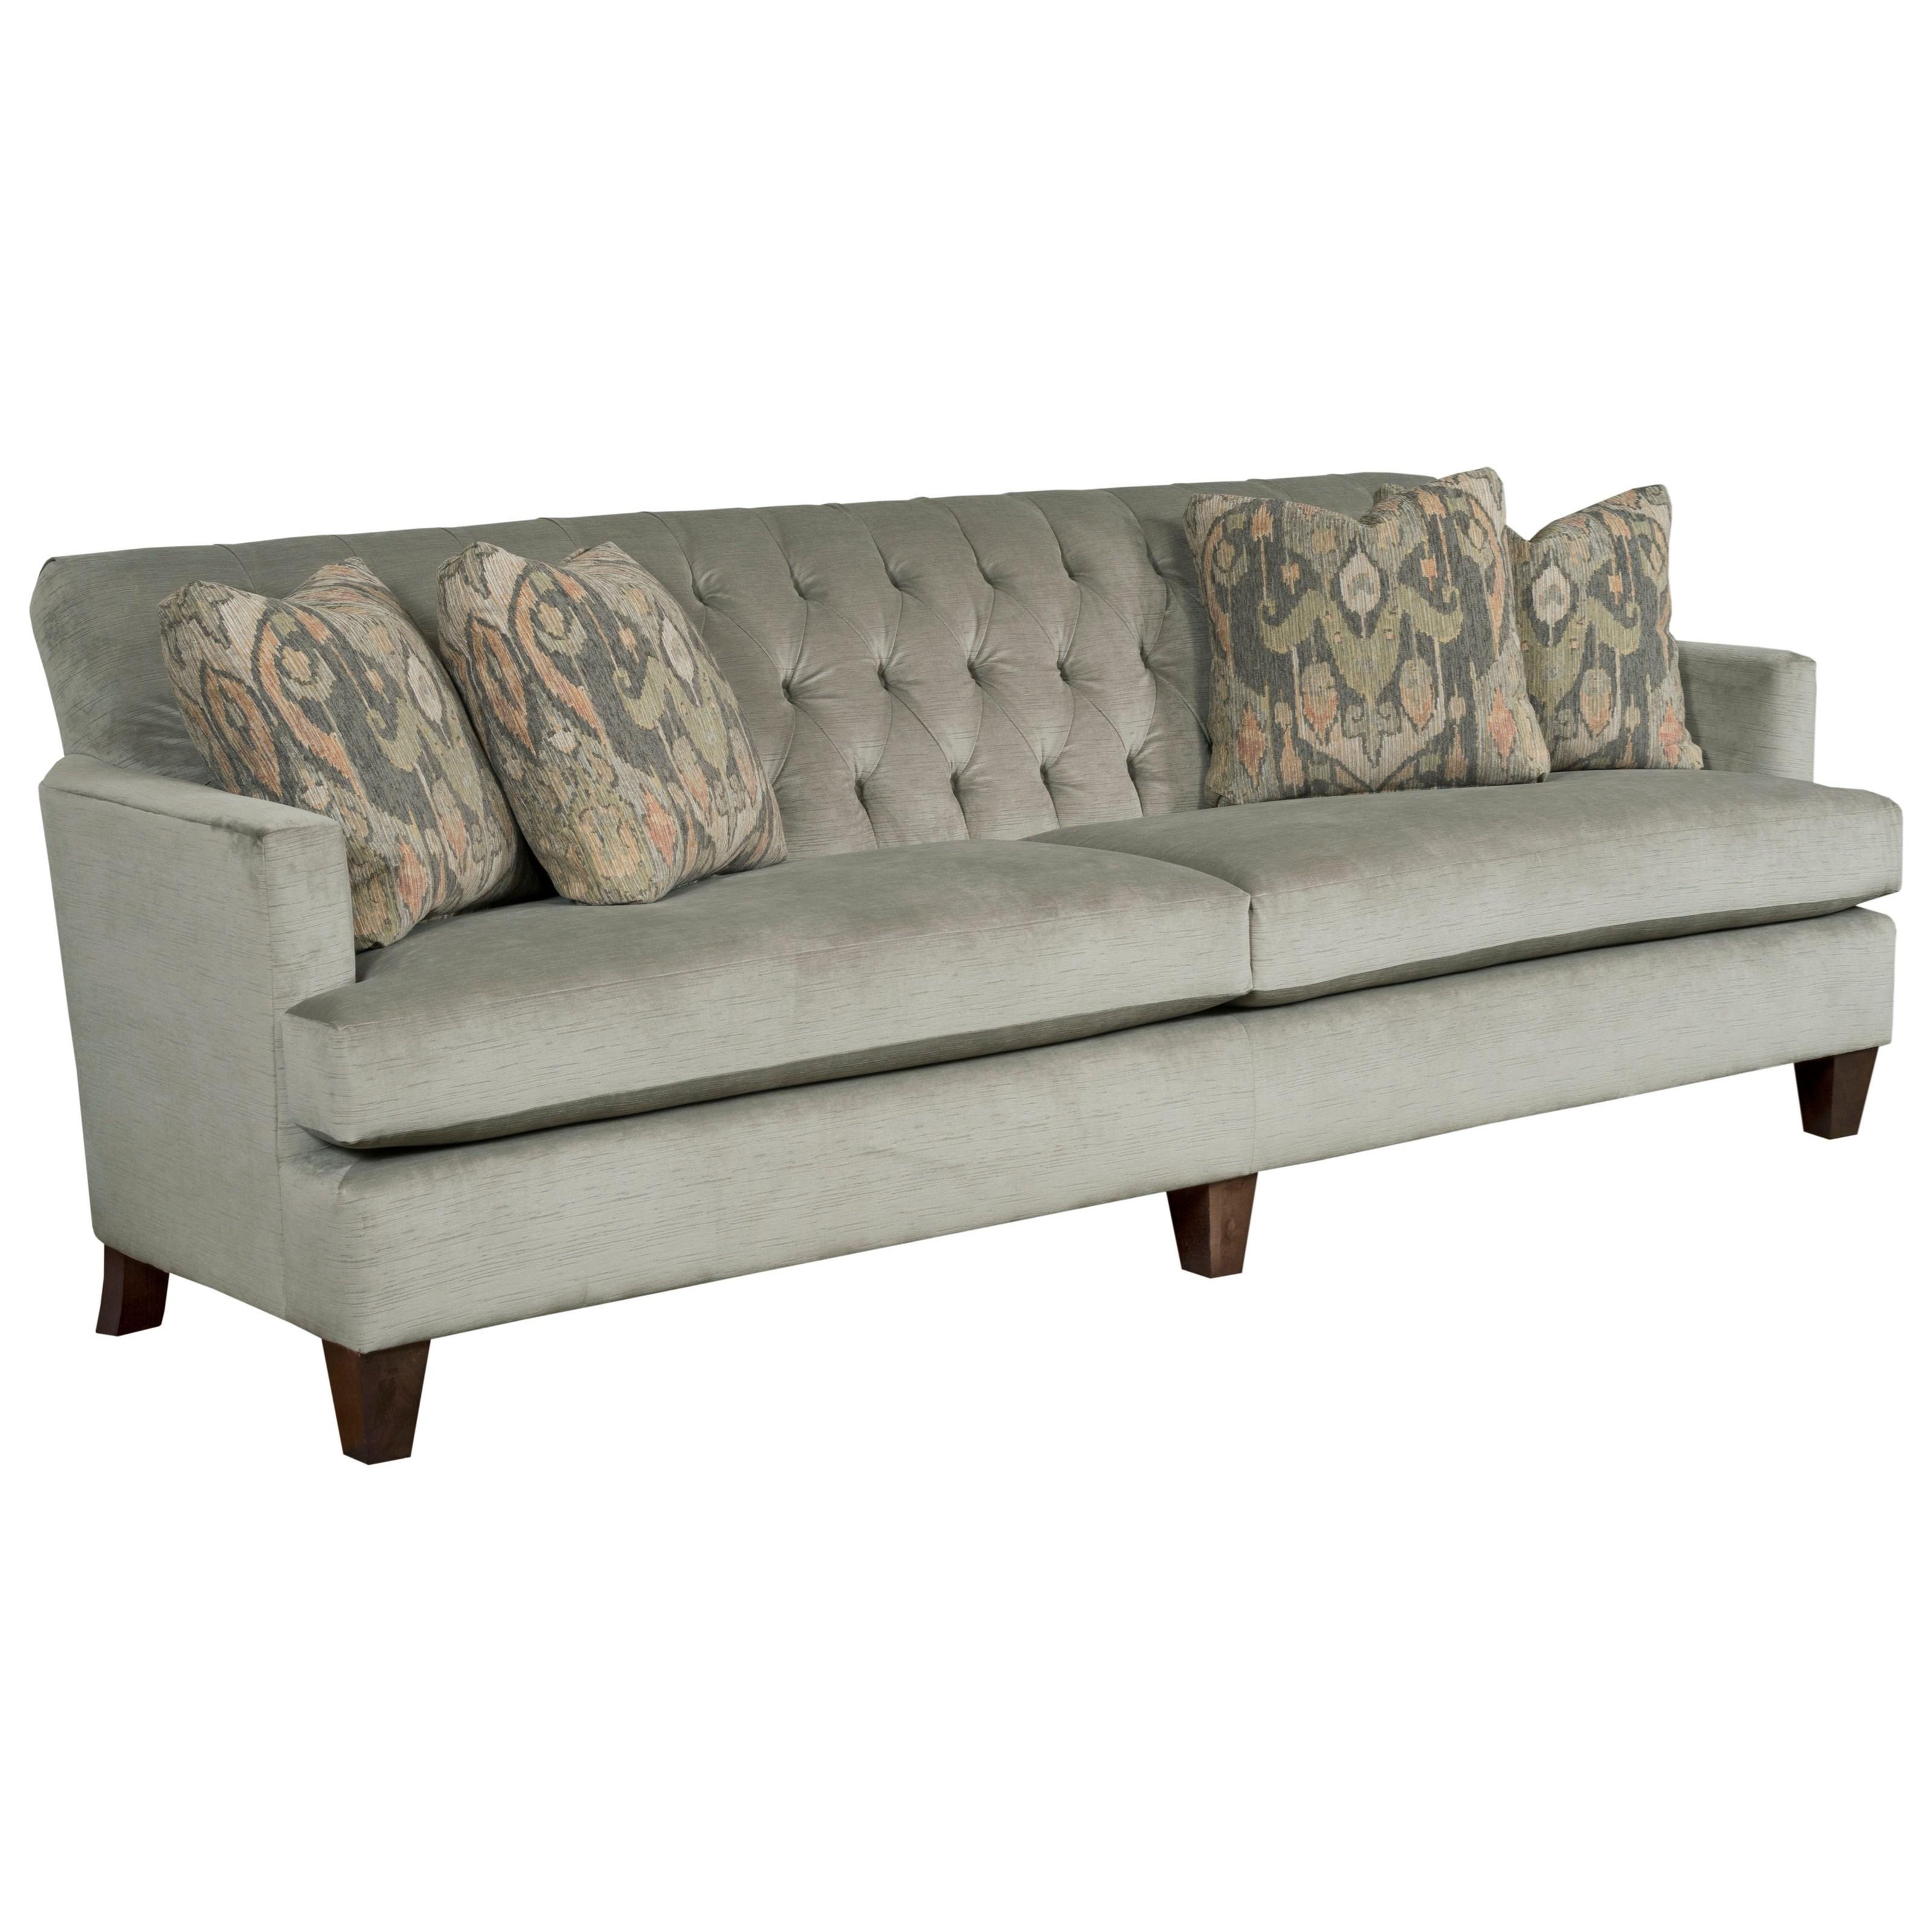 Carillon Grande Sofa by Kincaid Furniture at Johnny Janosik